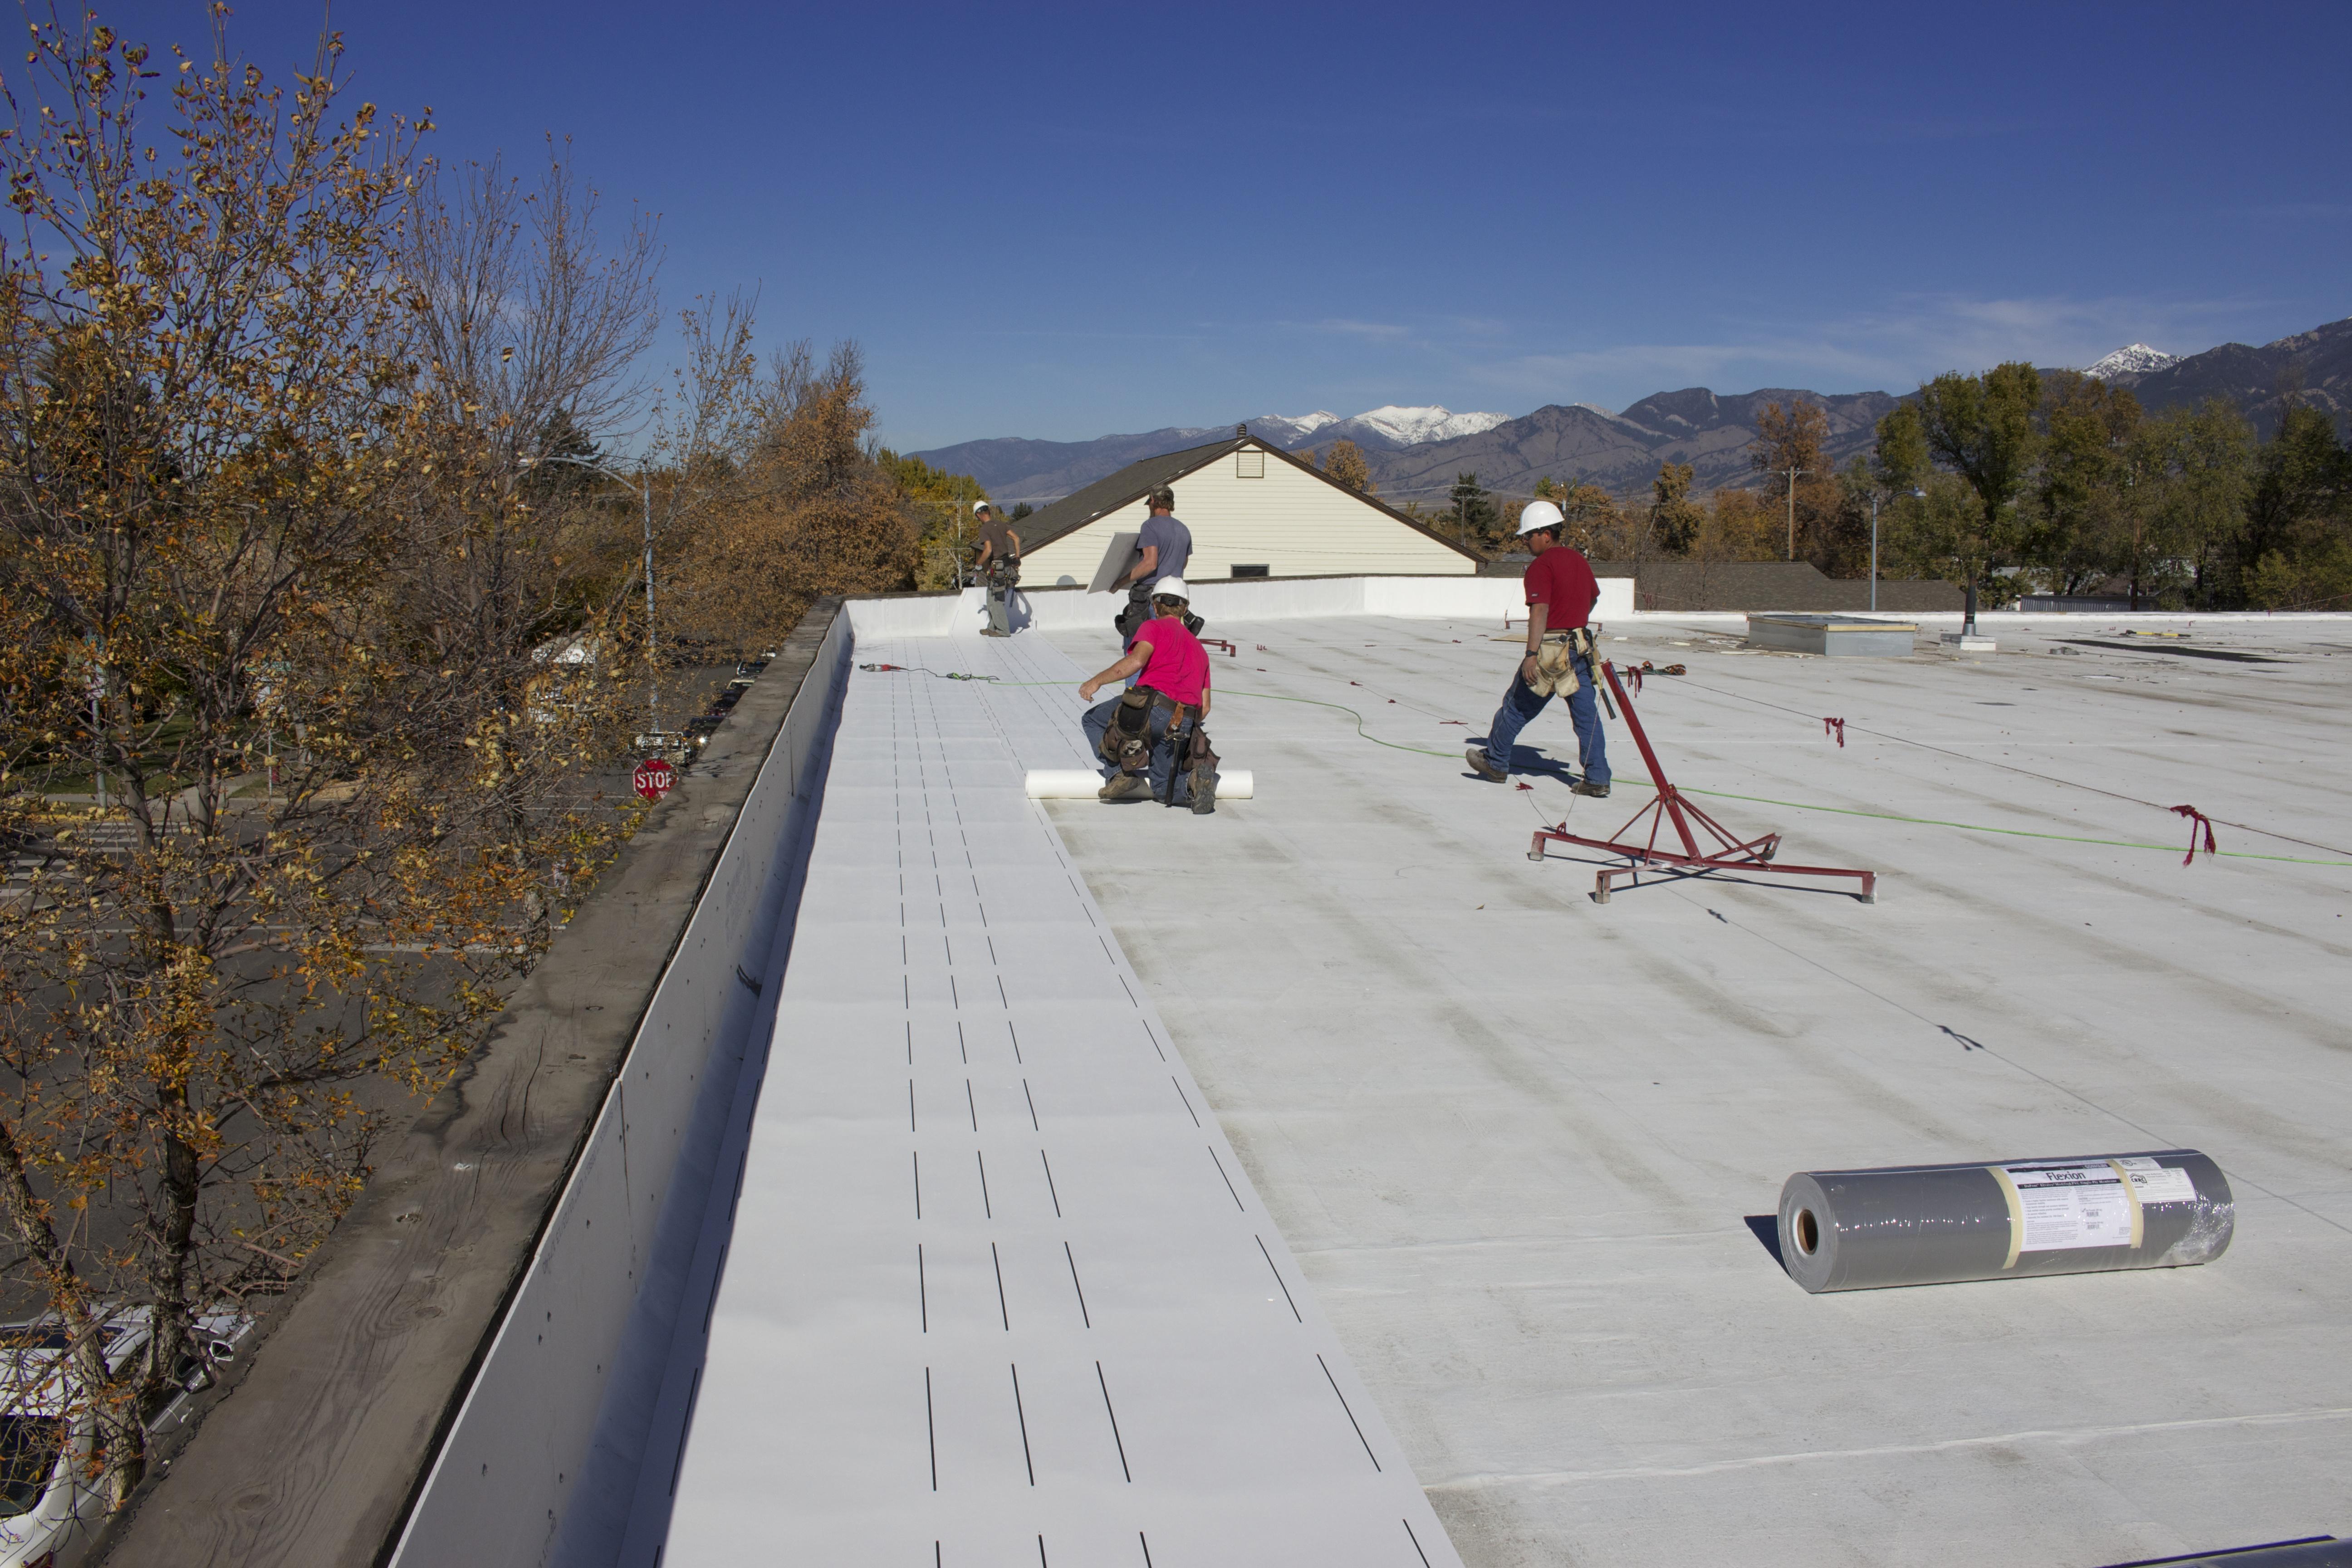 ametex roofing waco texas technicians on the job site